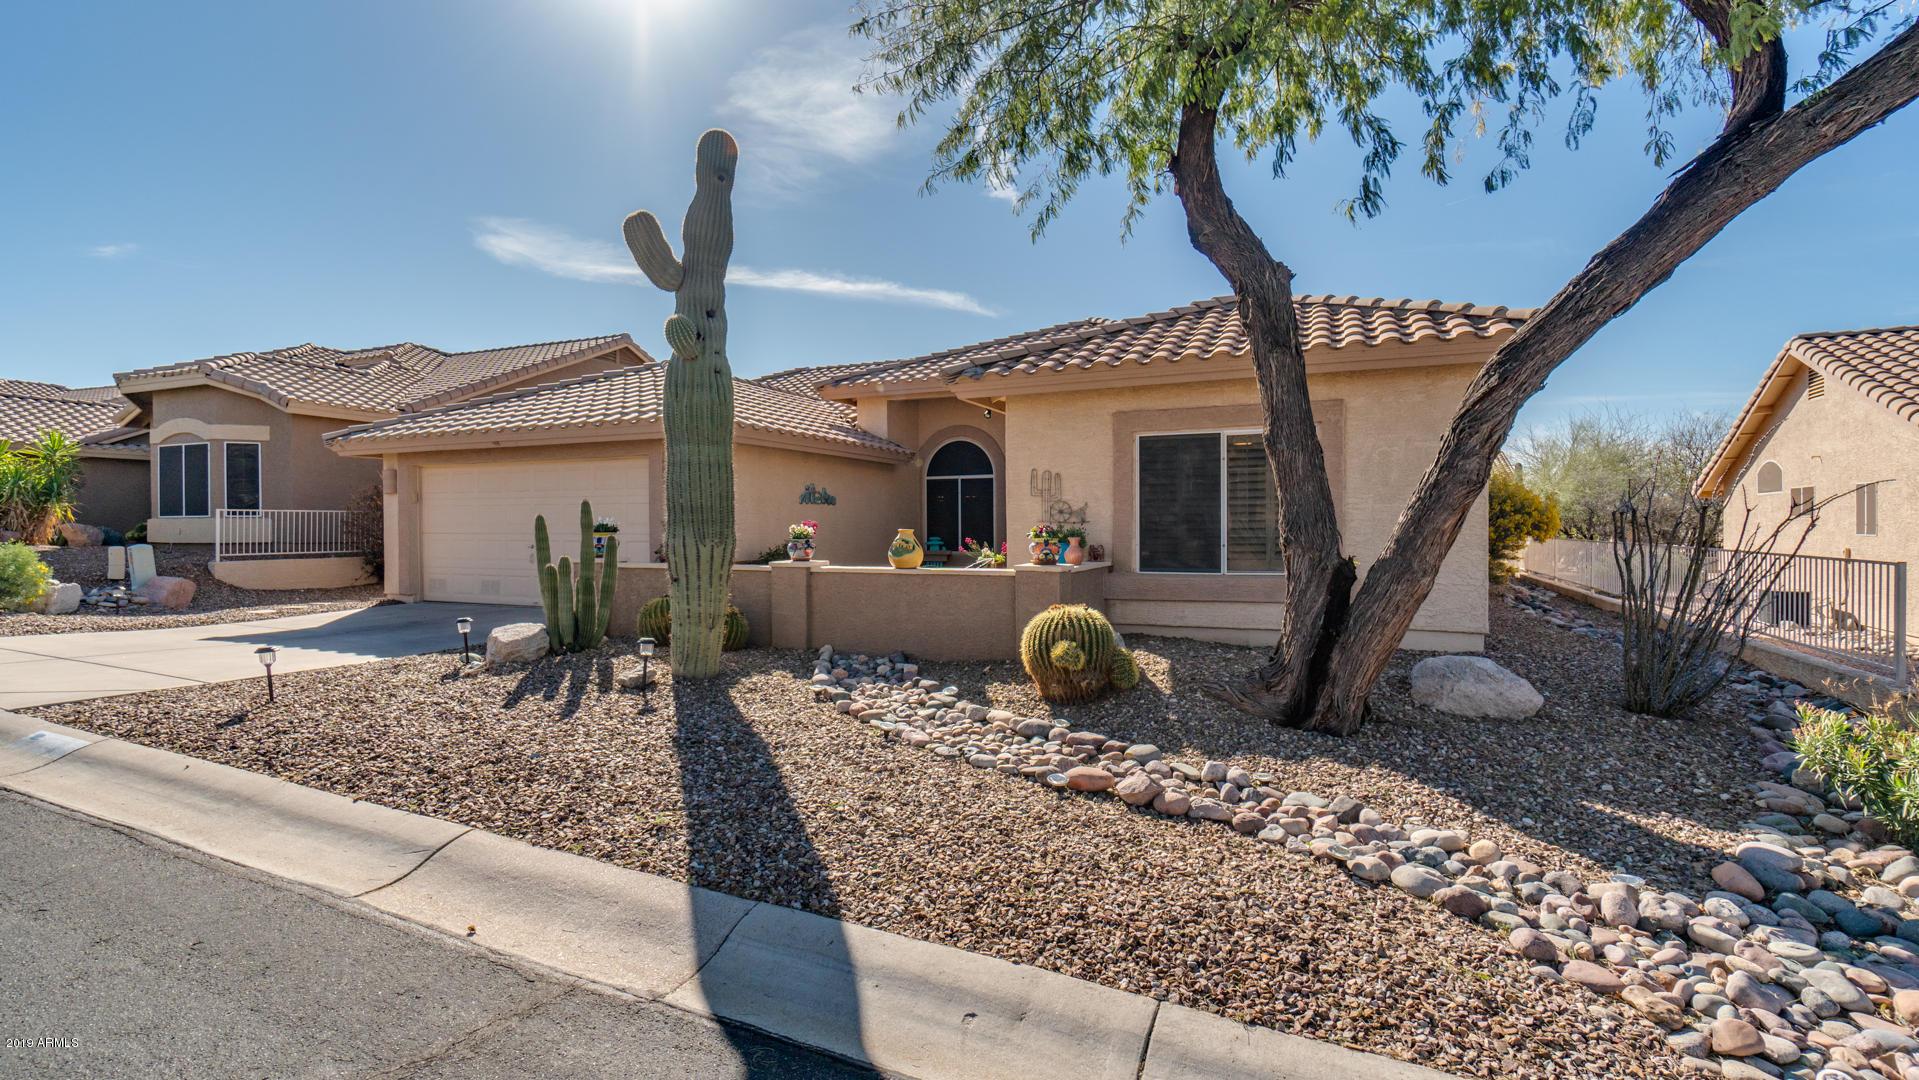 MLS 5897325 8903 E YUCCA BLOSSOM Drive, Gold Canyon, AZ 85118 Gold Canyon AZ Mountainbrook Village